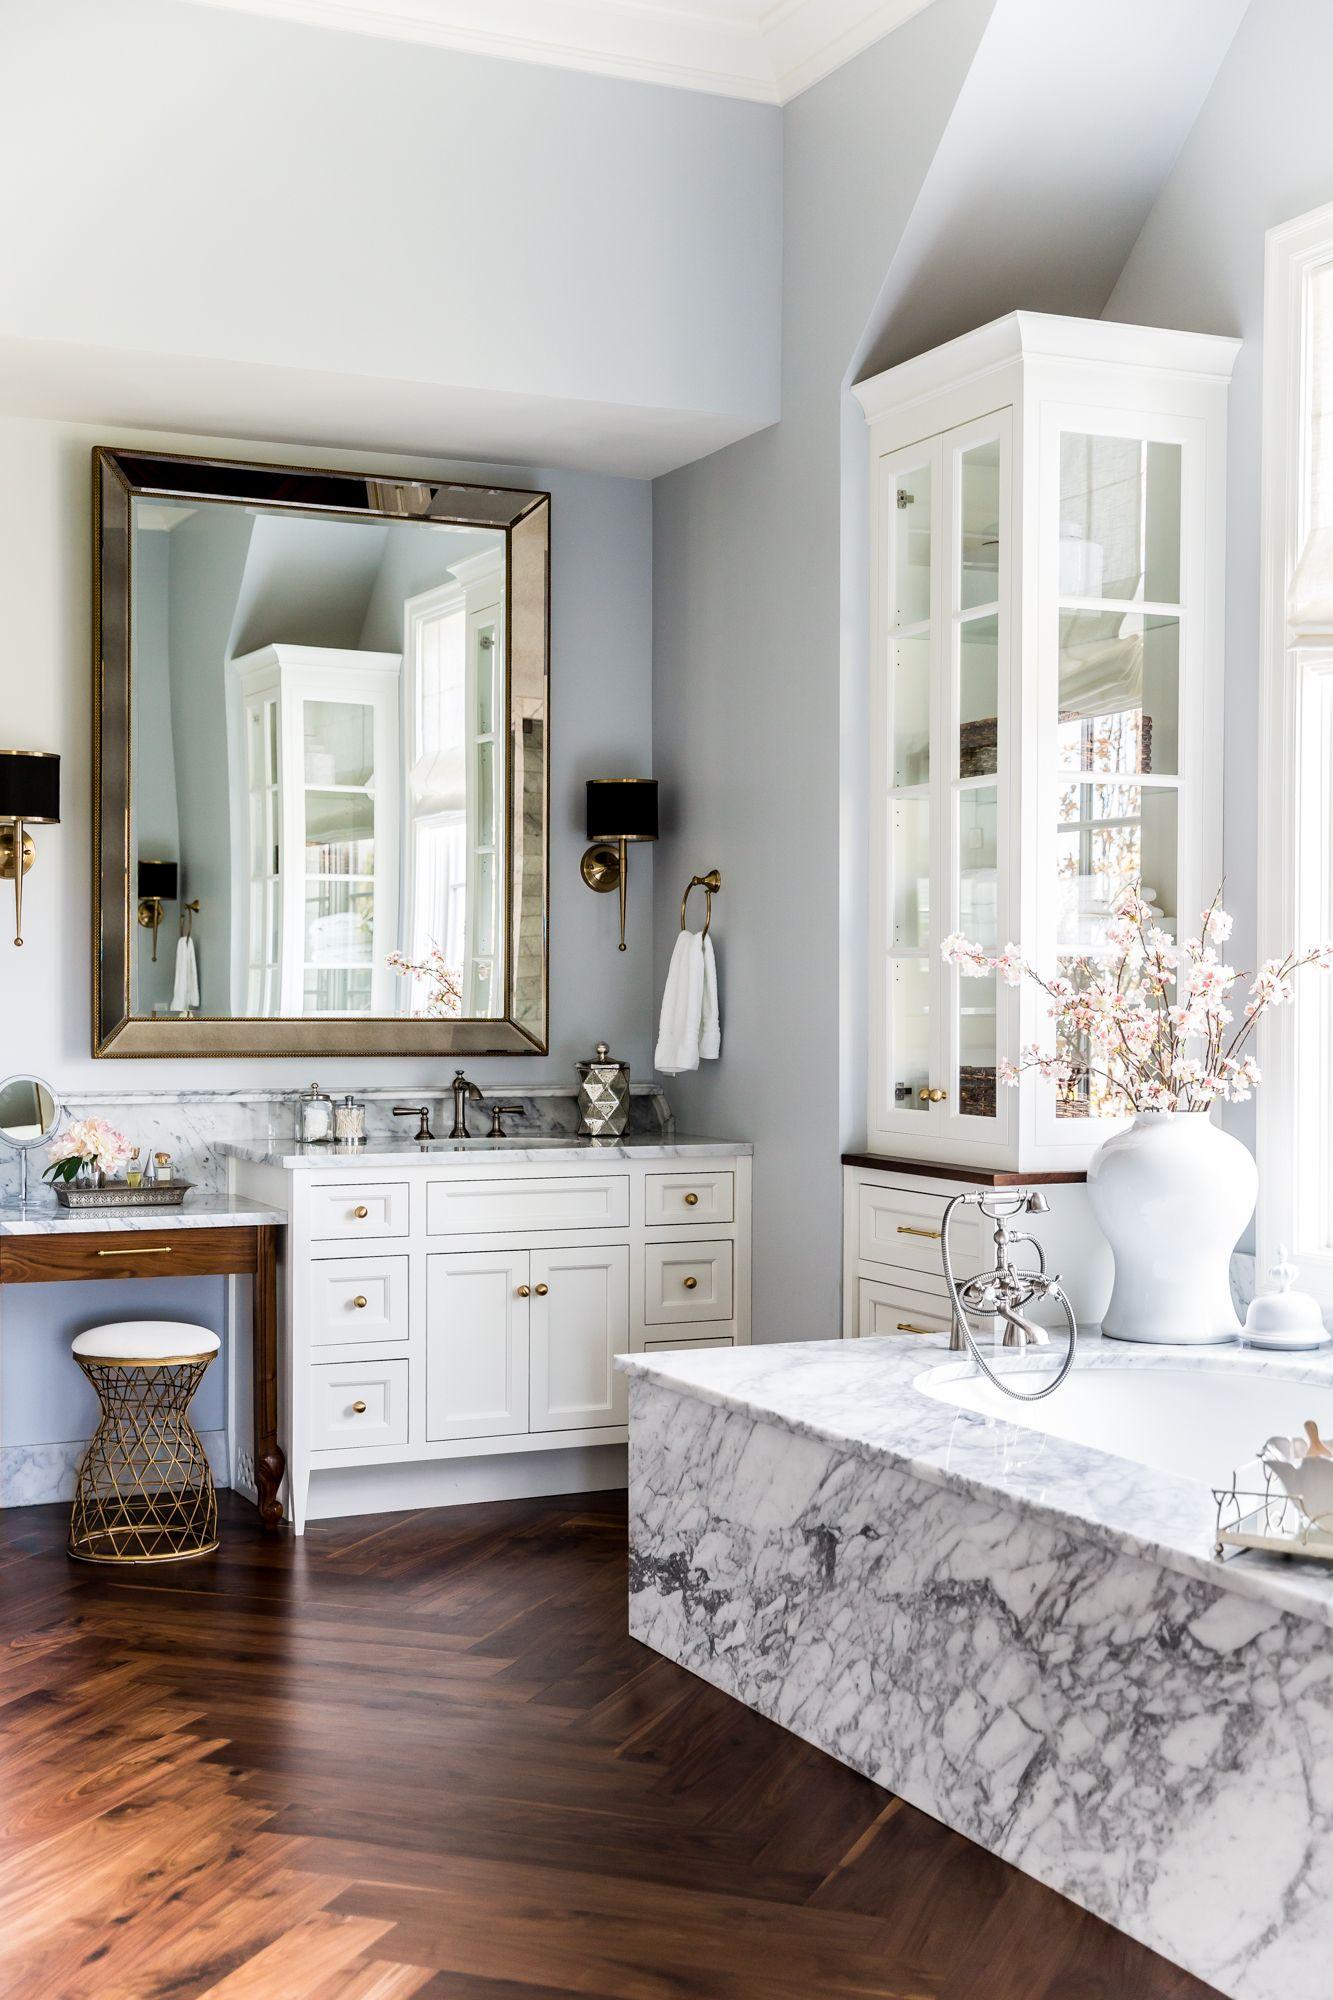 LIV SHOWROOM + DESIGN Photos by Lindsay Salazar | Bathroom Design ...